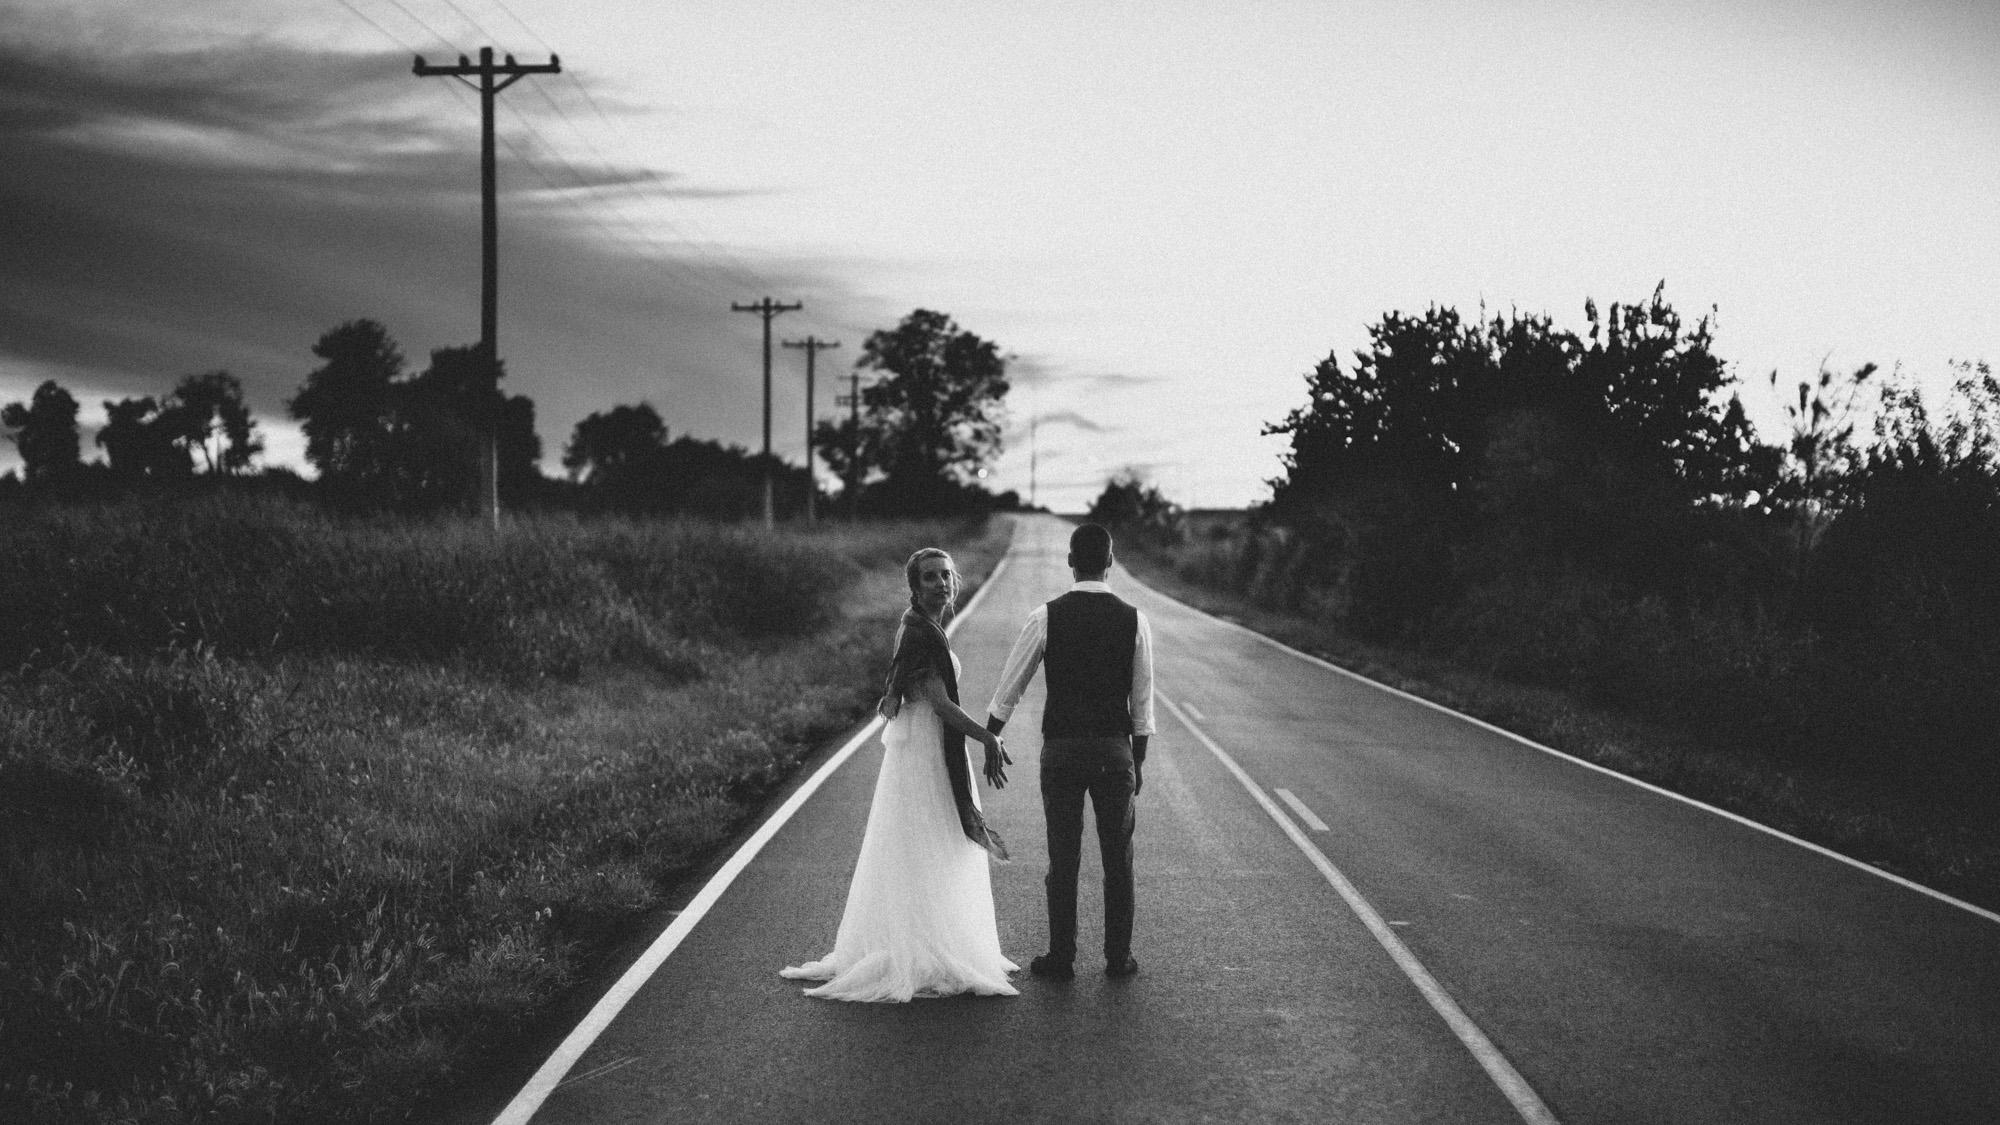 alec_vanderboom_springfield_missouri_wedding-0082.jpg